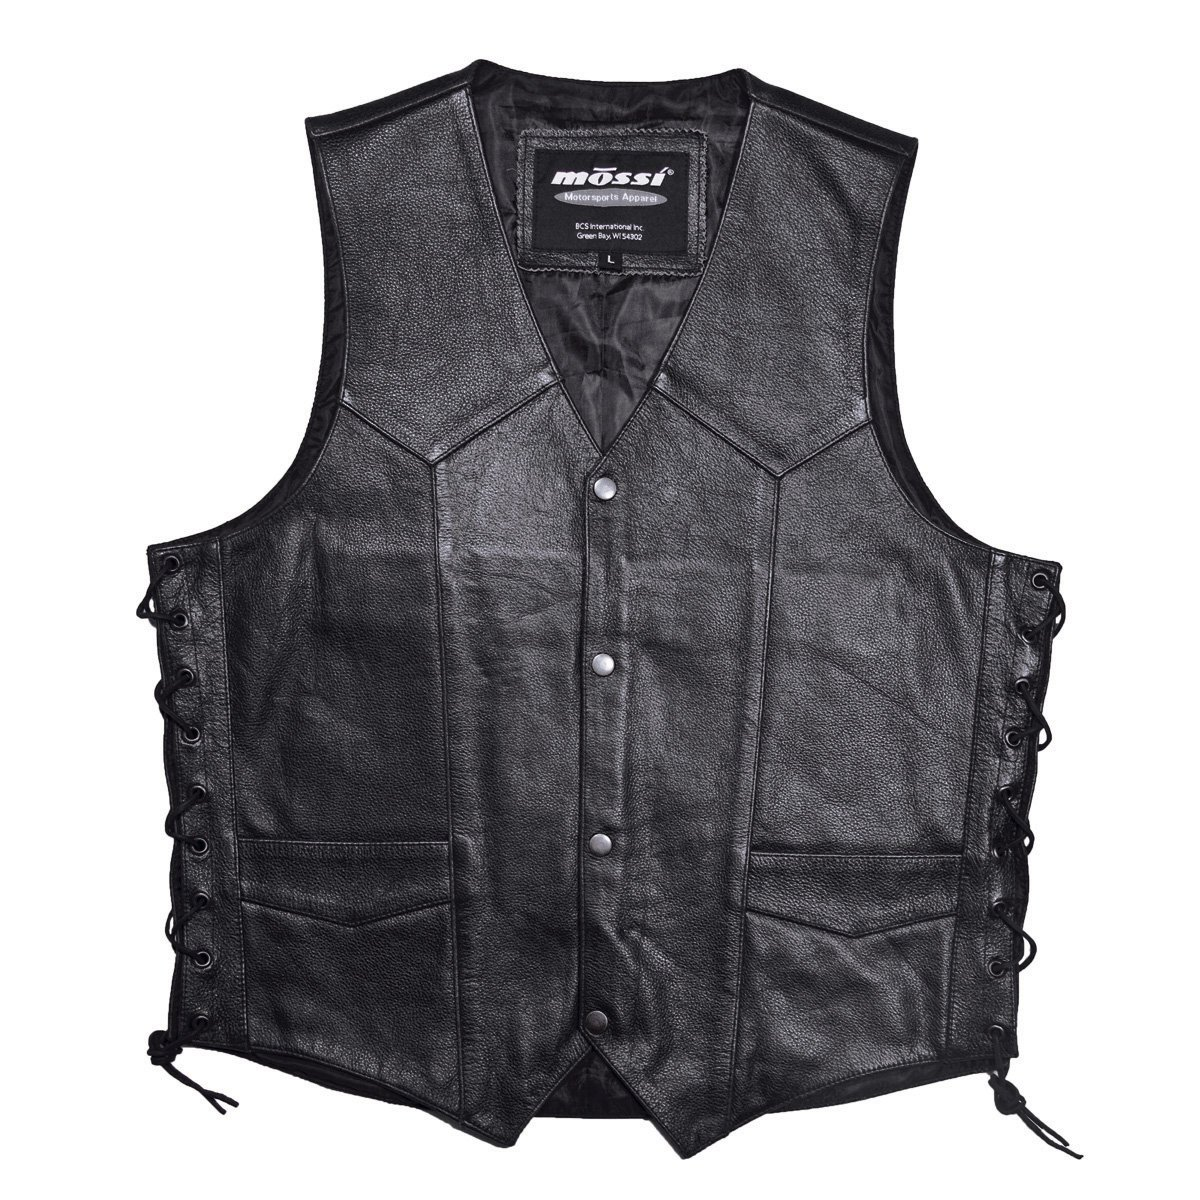 Mossi Live to Ride Men's Vest (Black, Size 52)